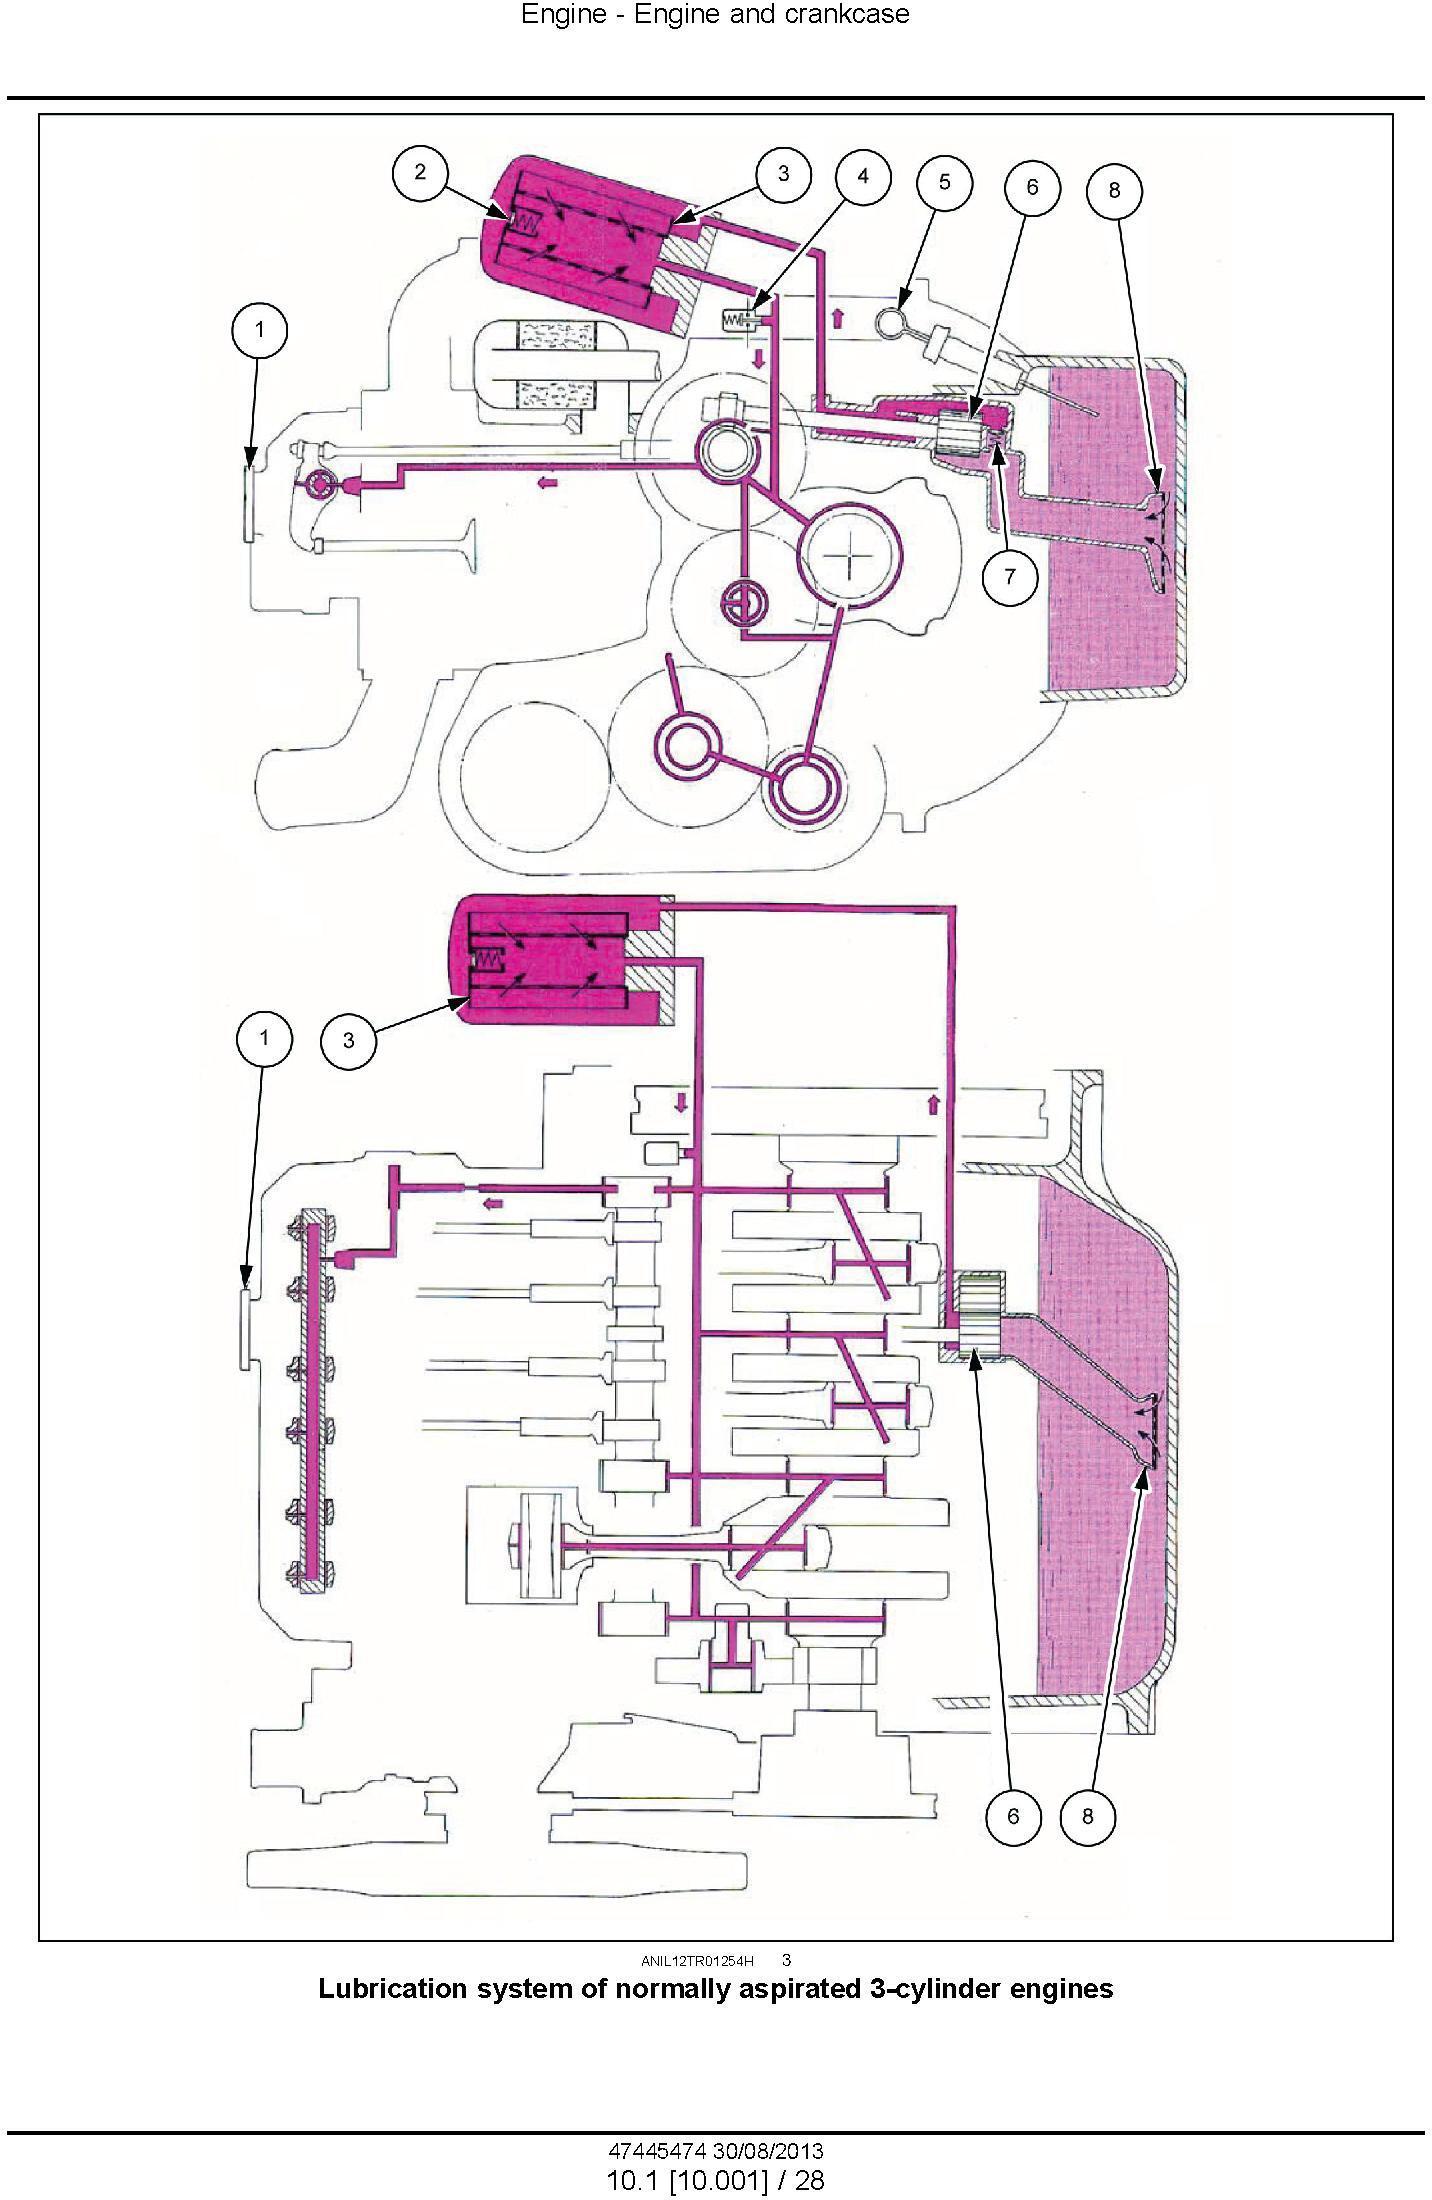 New Holland TD5.65, TD5.75, TD5.85, TD5.95, TD5.105, TD5.115 Tractor Service Manual - 2